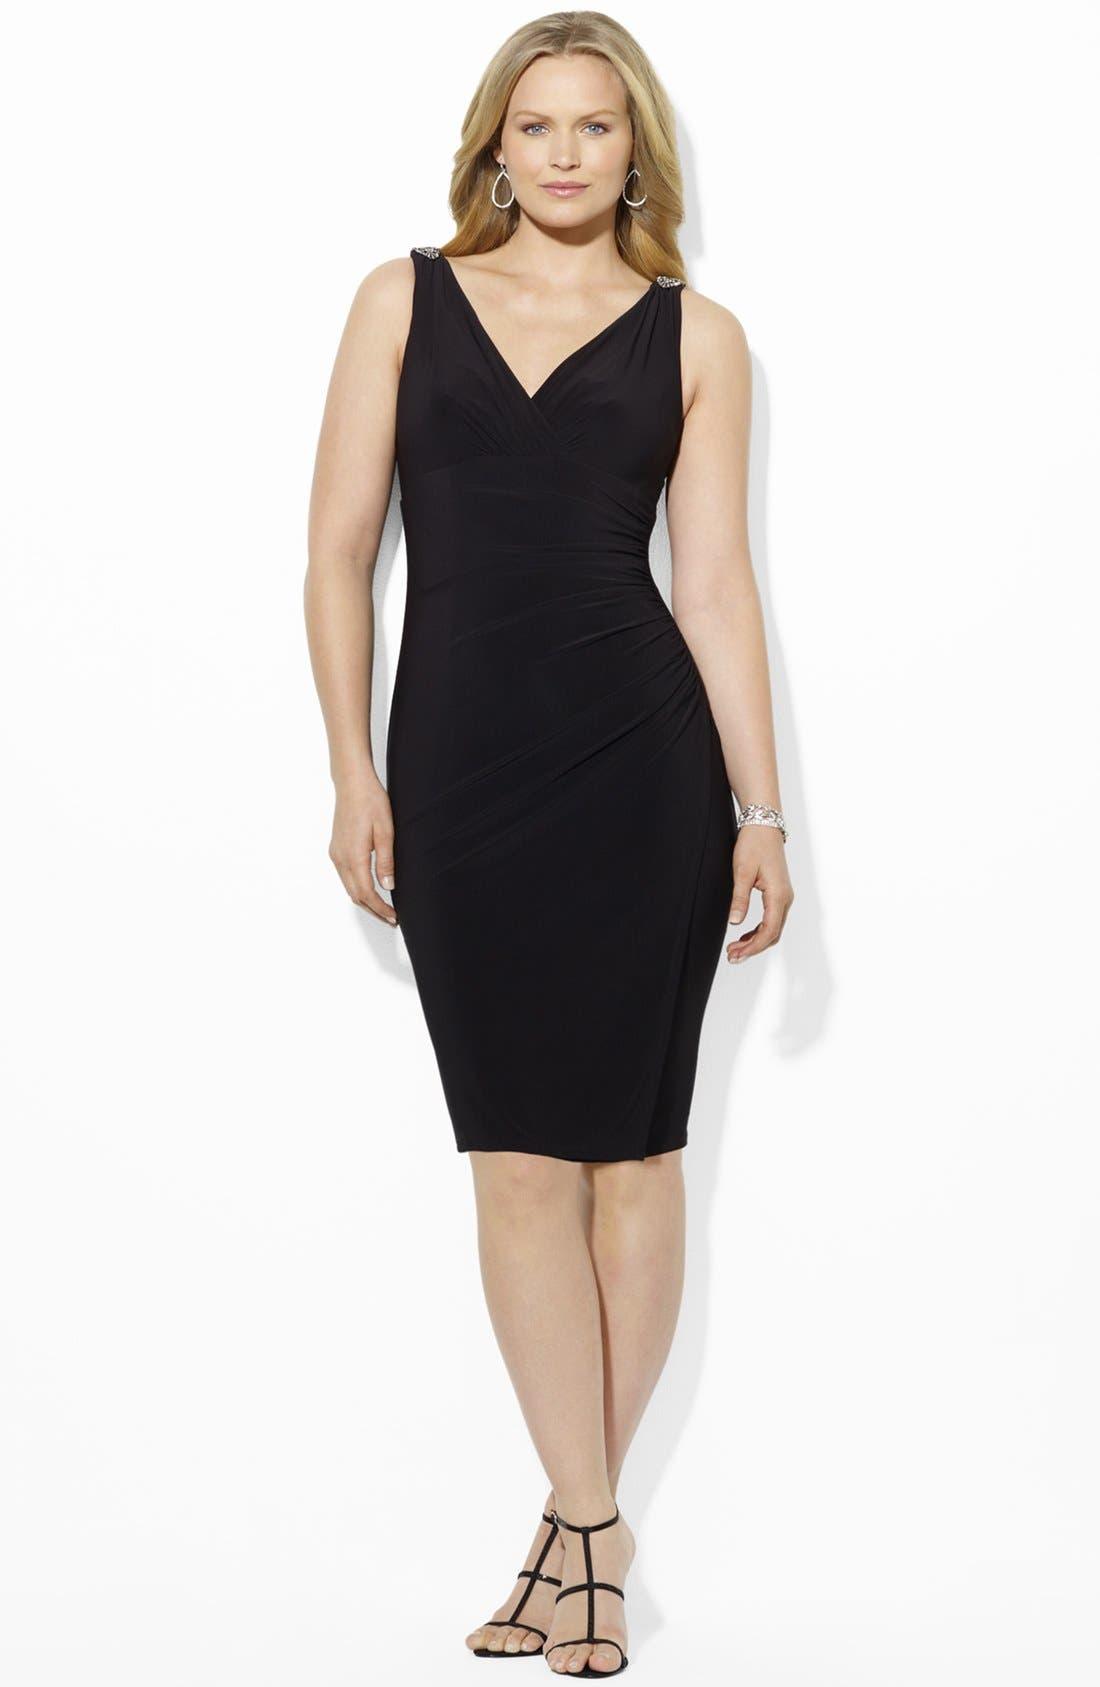 Alternate Image 1 Selected - Lauren Ralph Lauren Embellished Matte Jersey Dress (Plus Size)